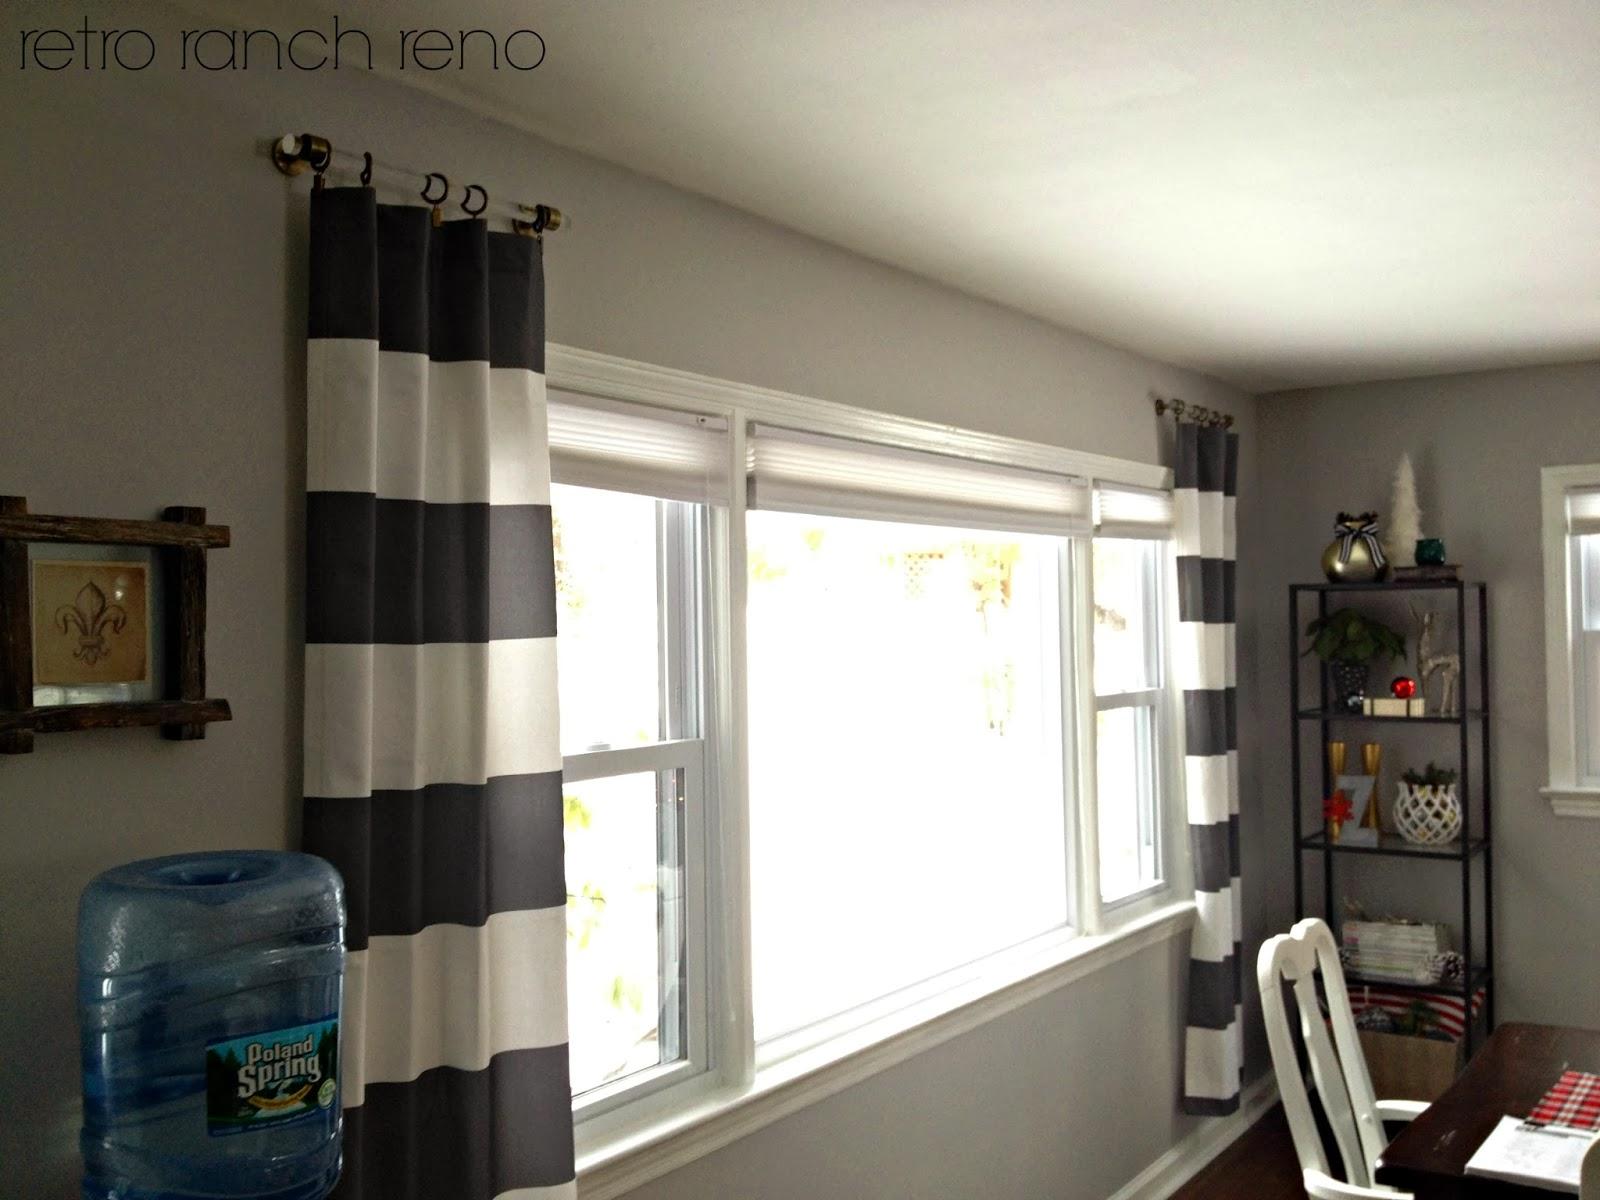 Retro Ranch Reno Lucite Curtain Rods Amp A Question